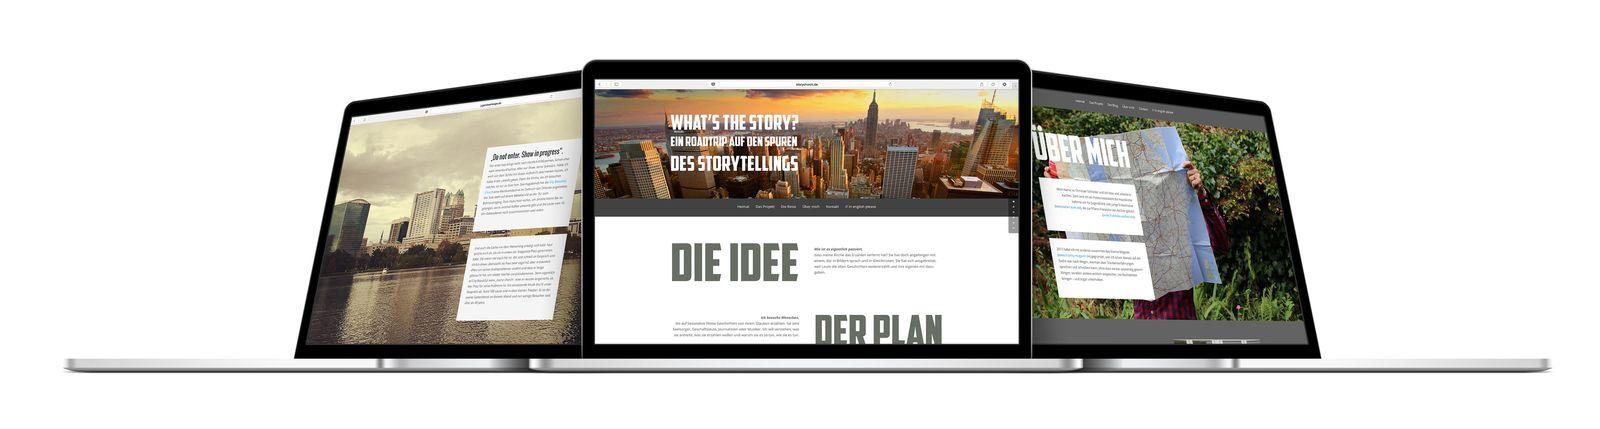 storychurch-mac02